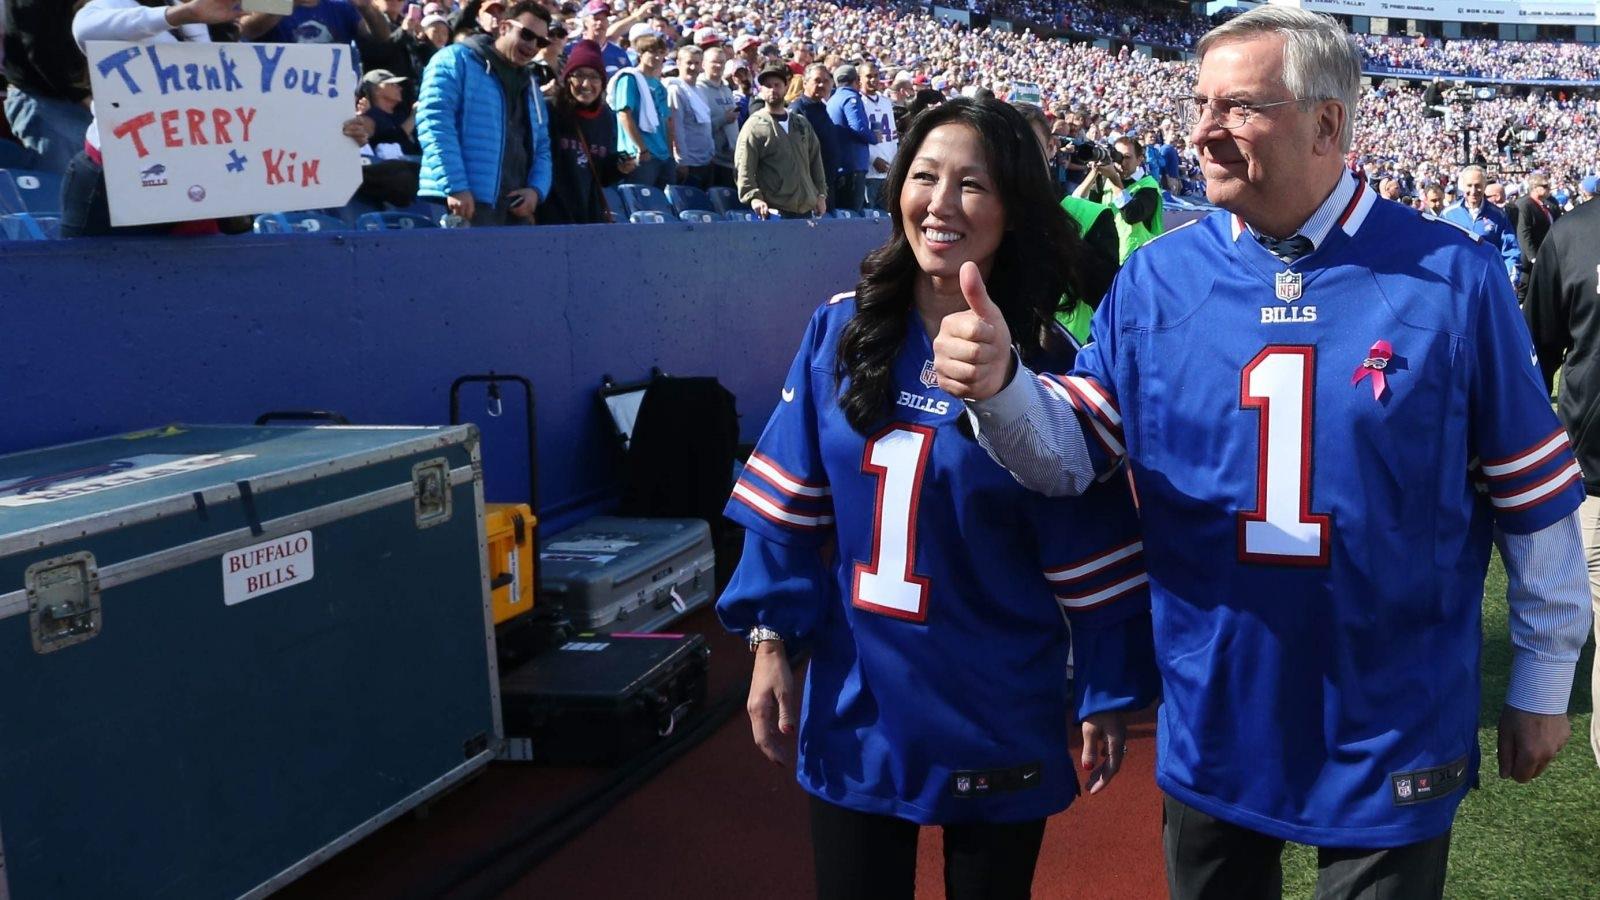 James P. McCoy/Buffalo News Terry and Kim Pegula are sainted figures for ensuring the long-term future of the Bills. (James P. McCoy/Buffalo News)